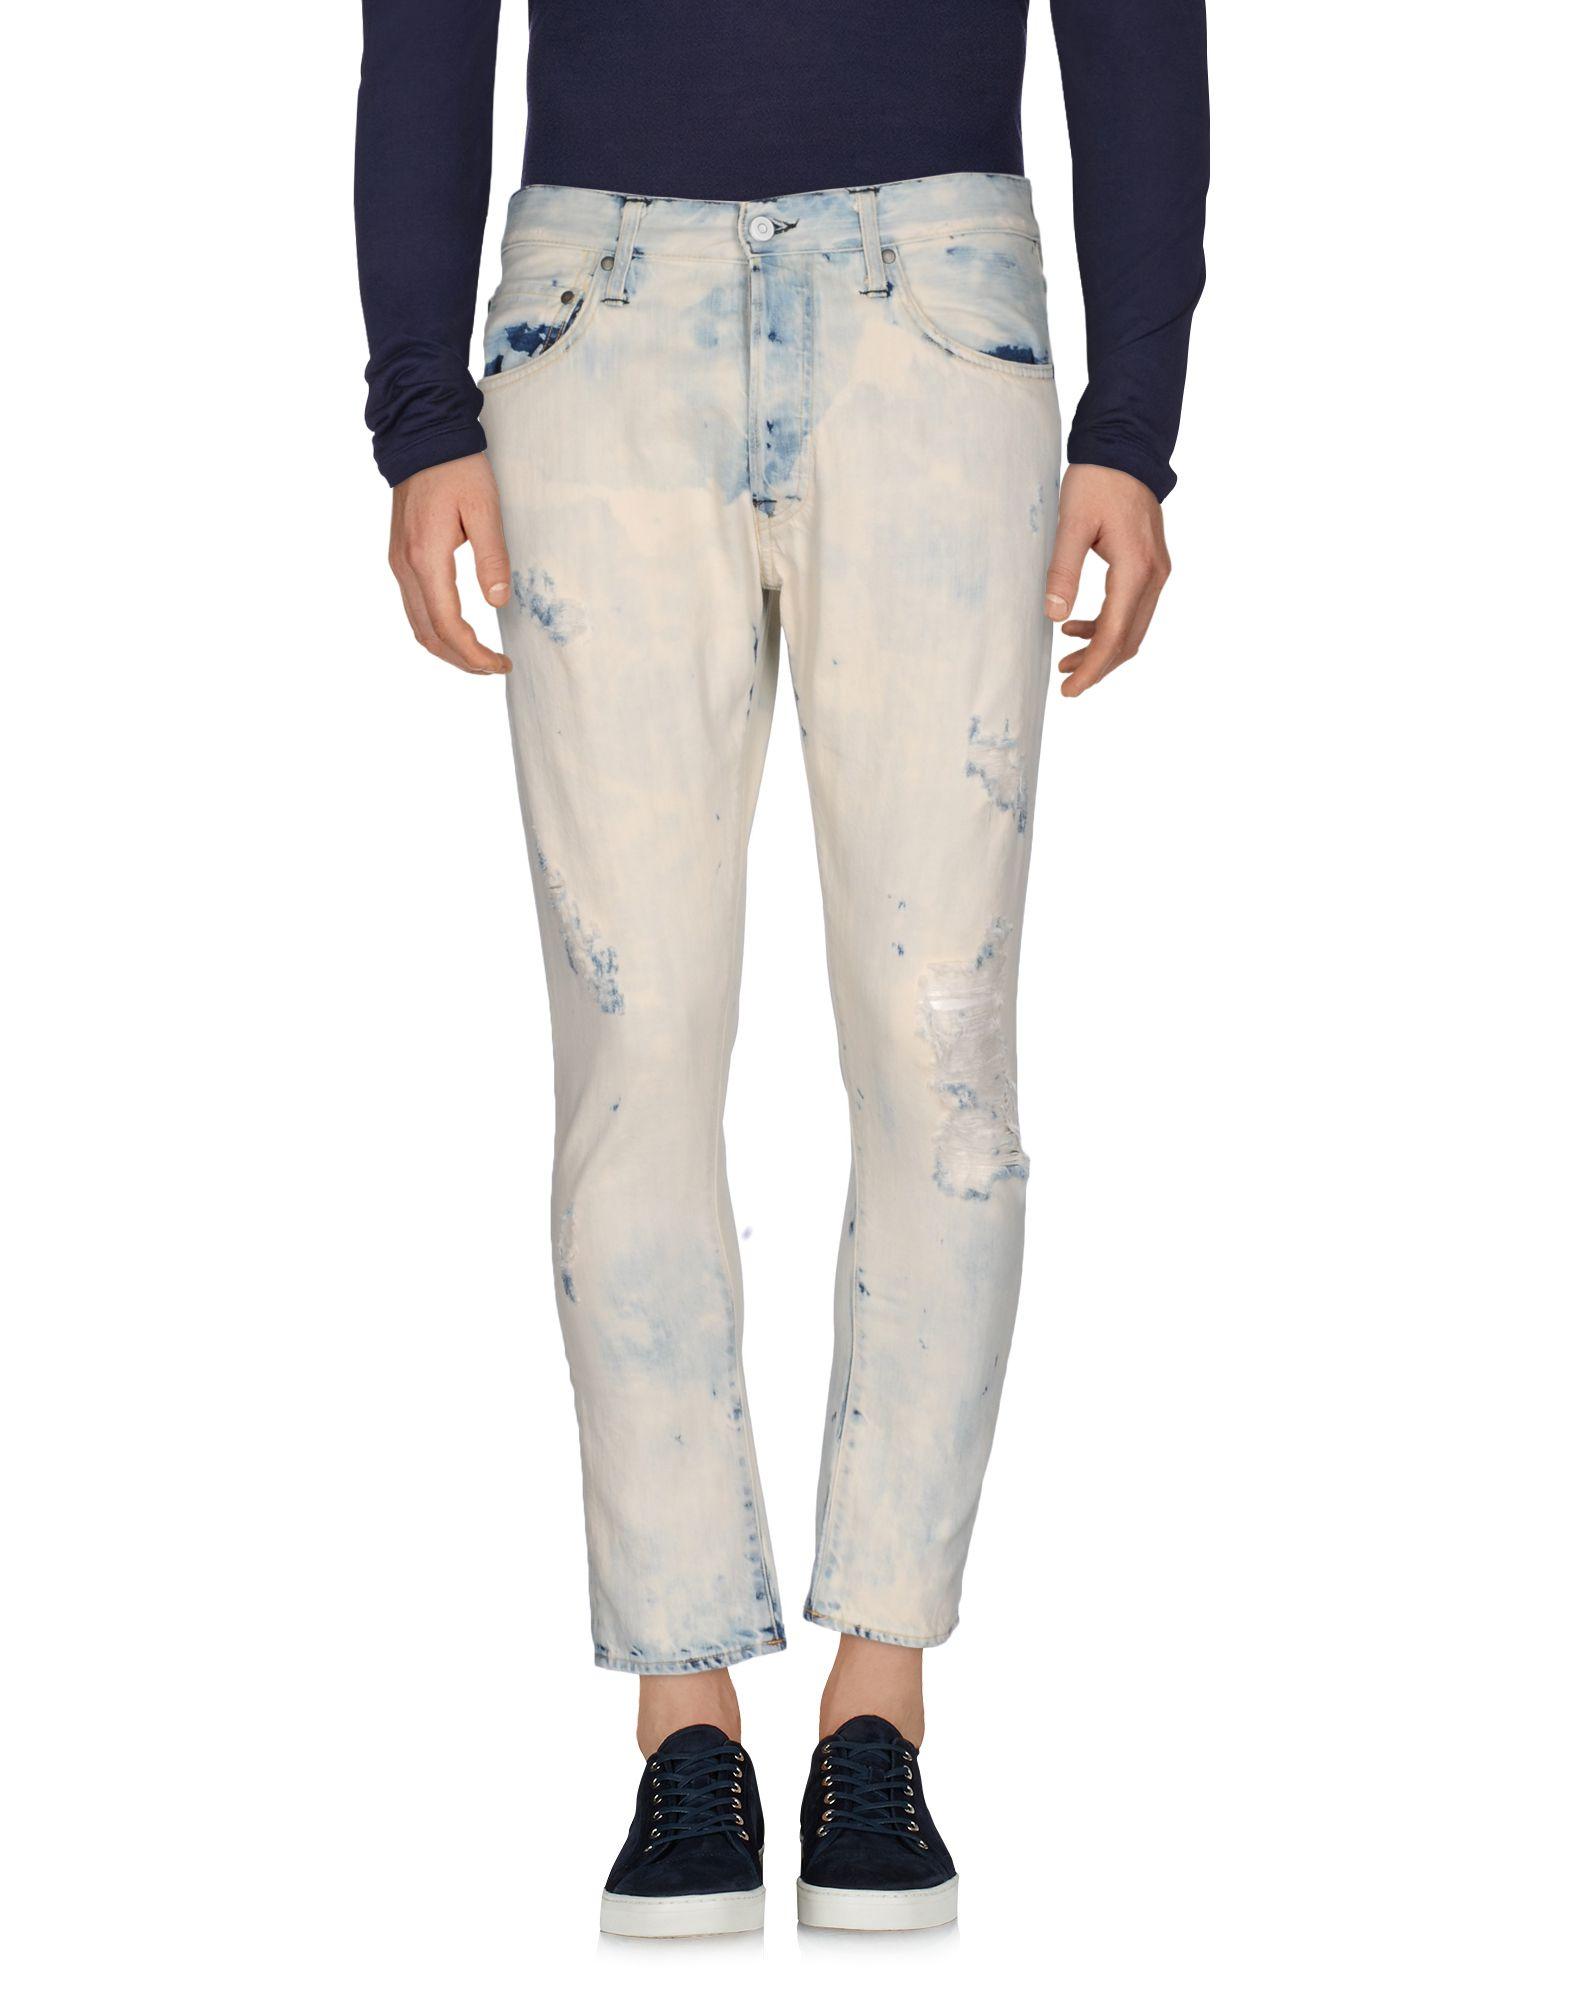 Pantaloni Jeans People Lab. Uomo - Acquista online su